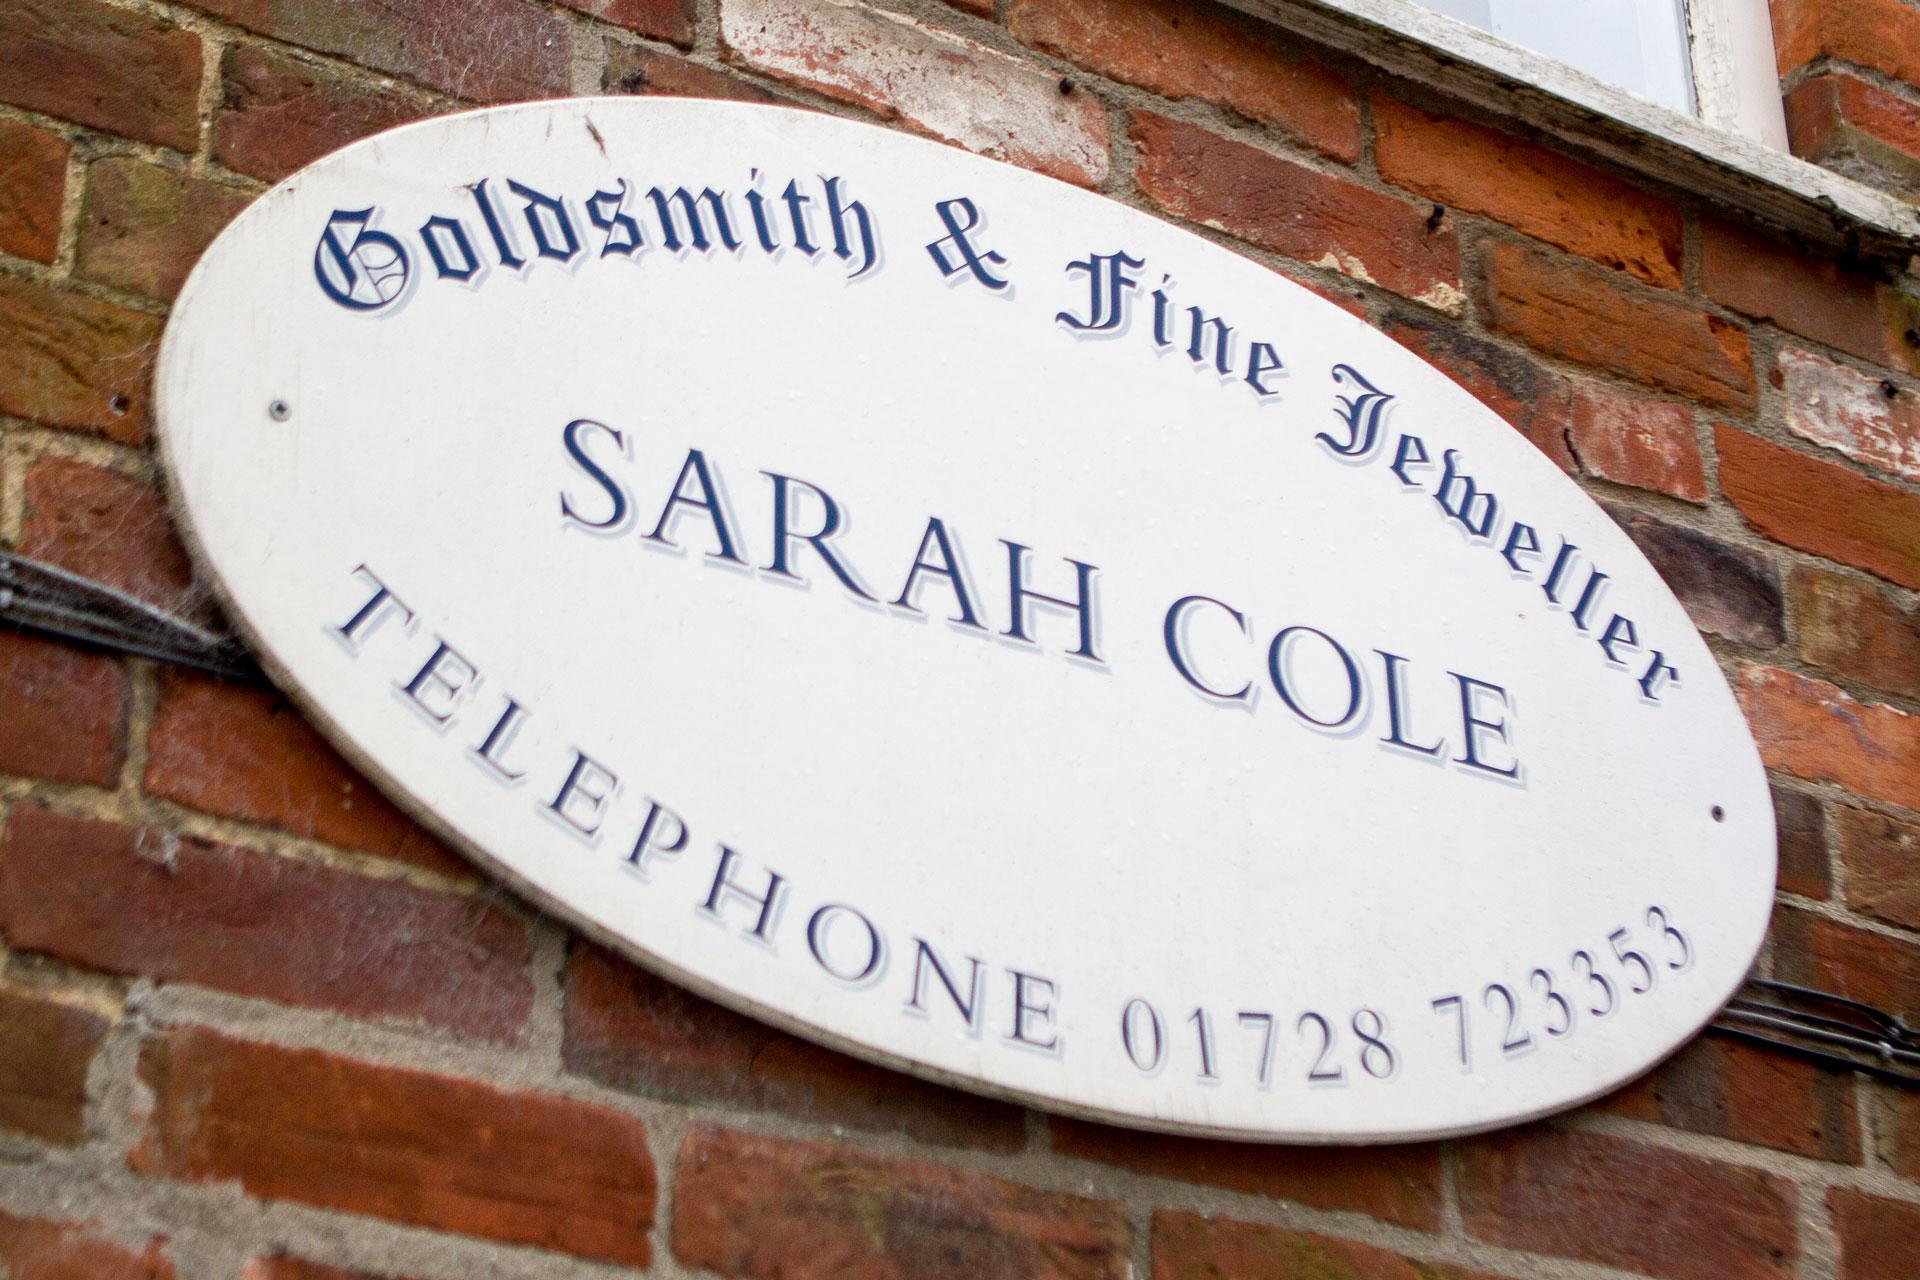 Sarah Cole Goldsmith and Fine Jeweller